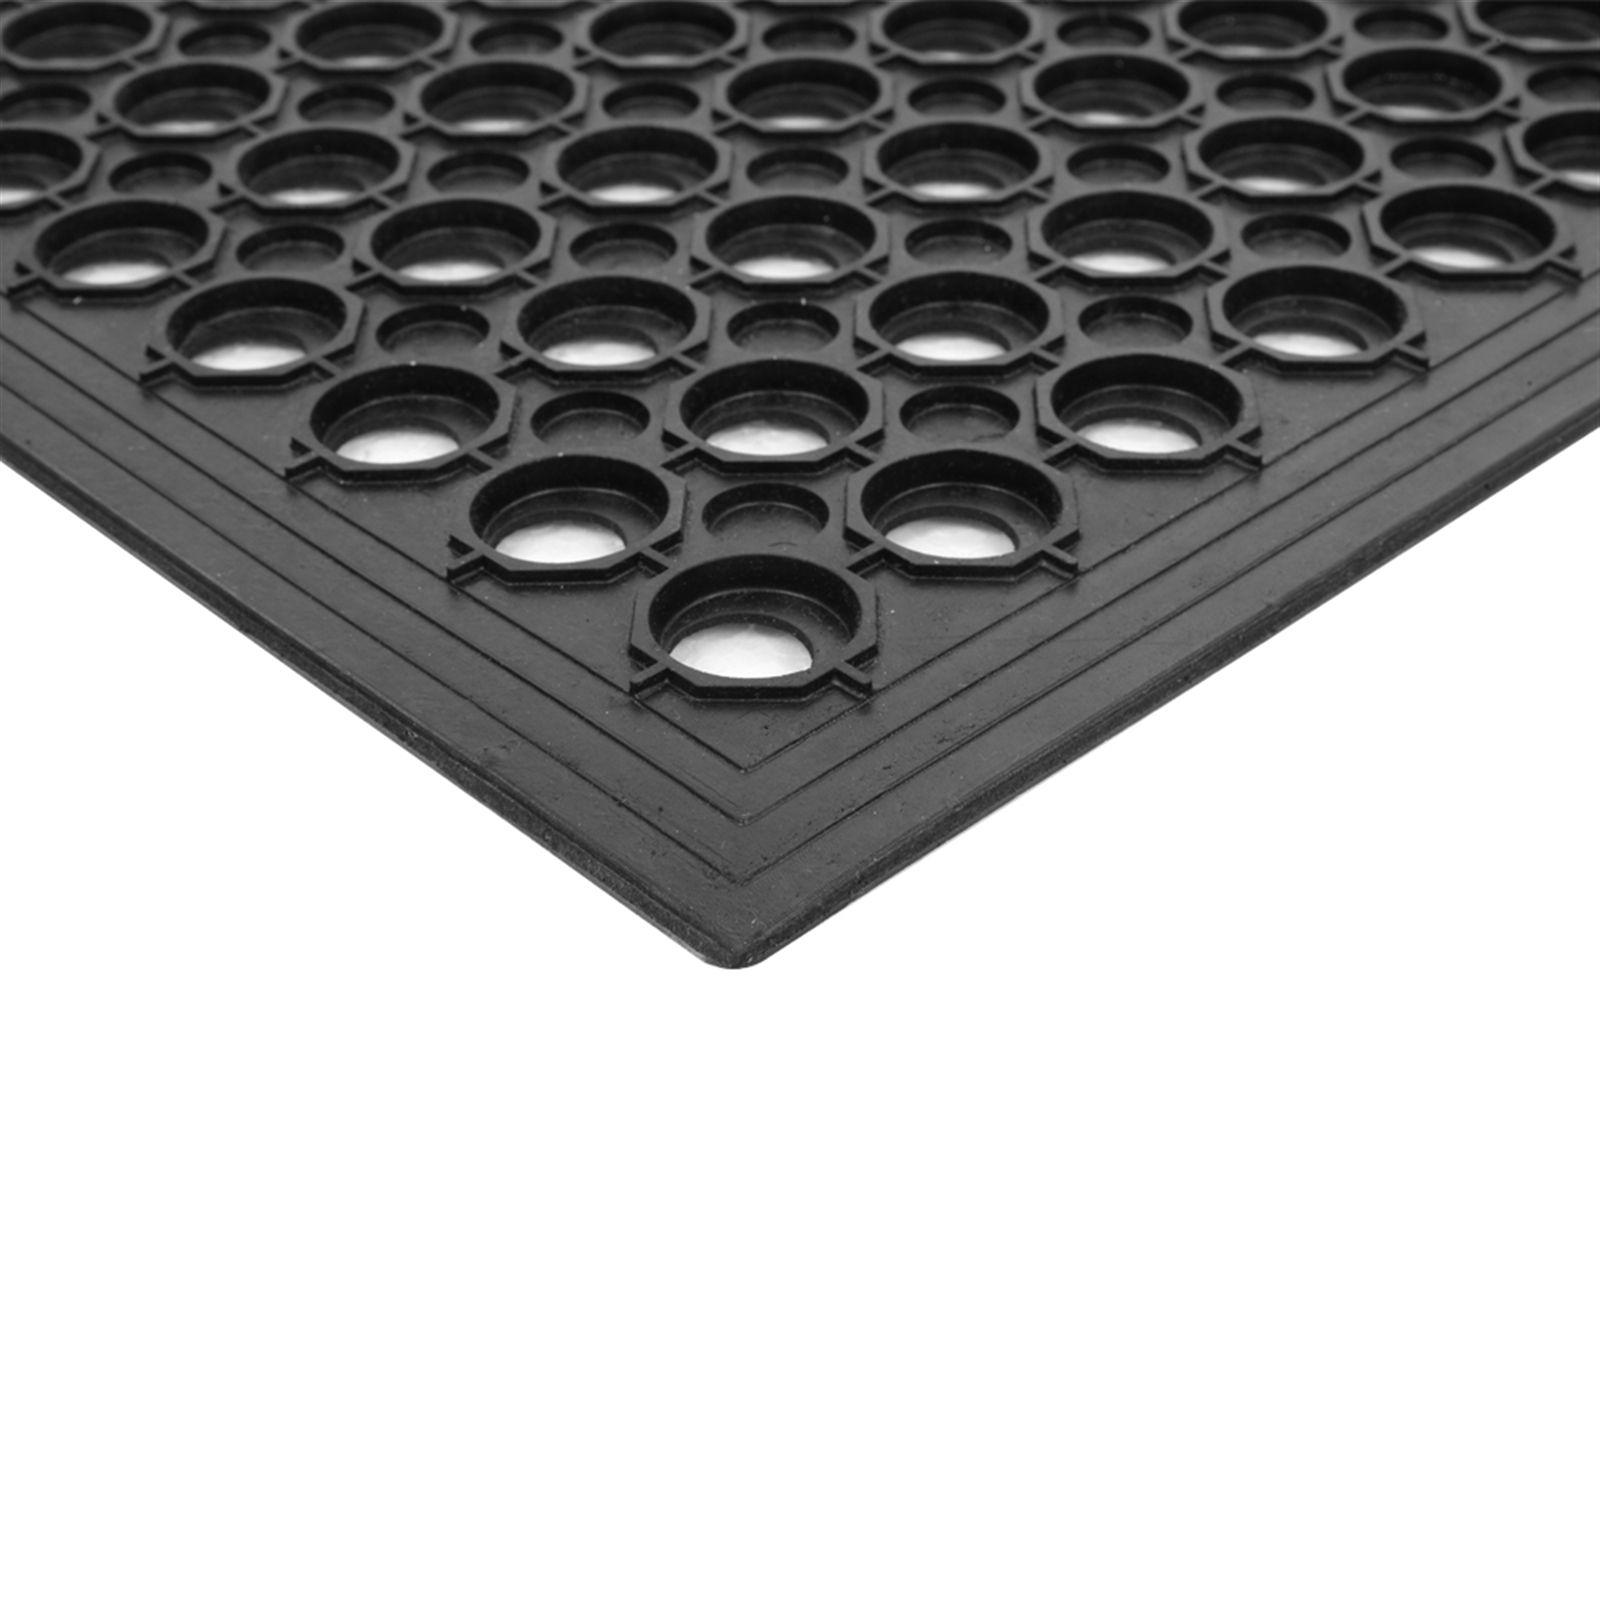 "Home Textiles Carpets Anti Fatigue Rubber For kitchen 6 ""x 9"" Restaurant Bar Floor Commercial Heavy Duty Drain Black Slip Mat"